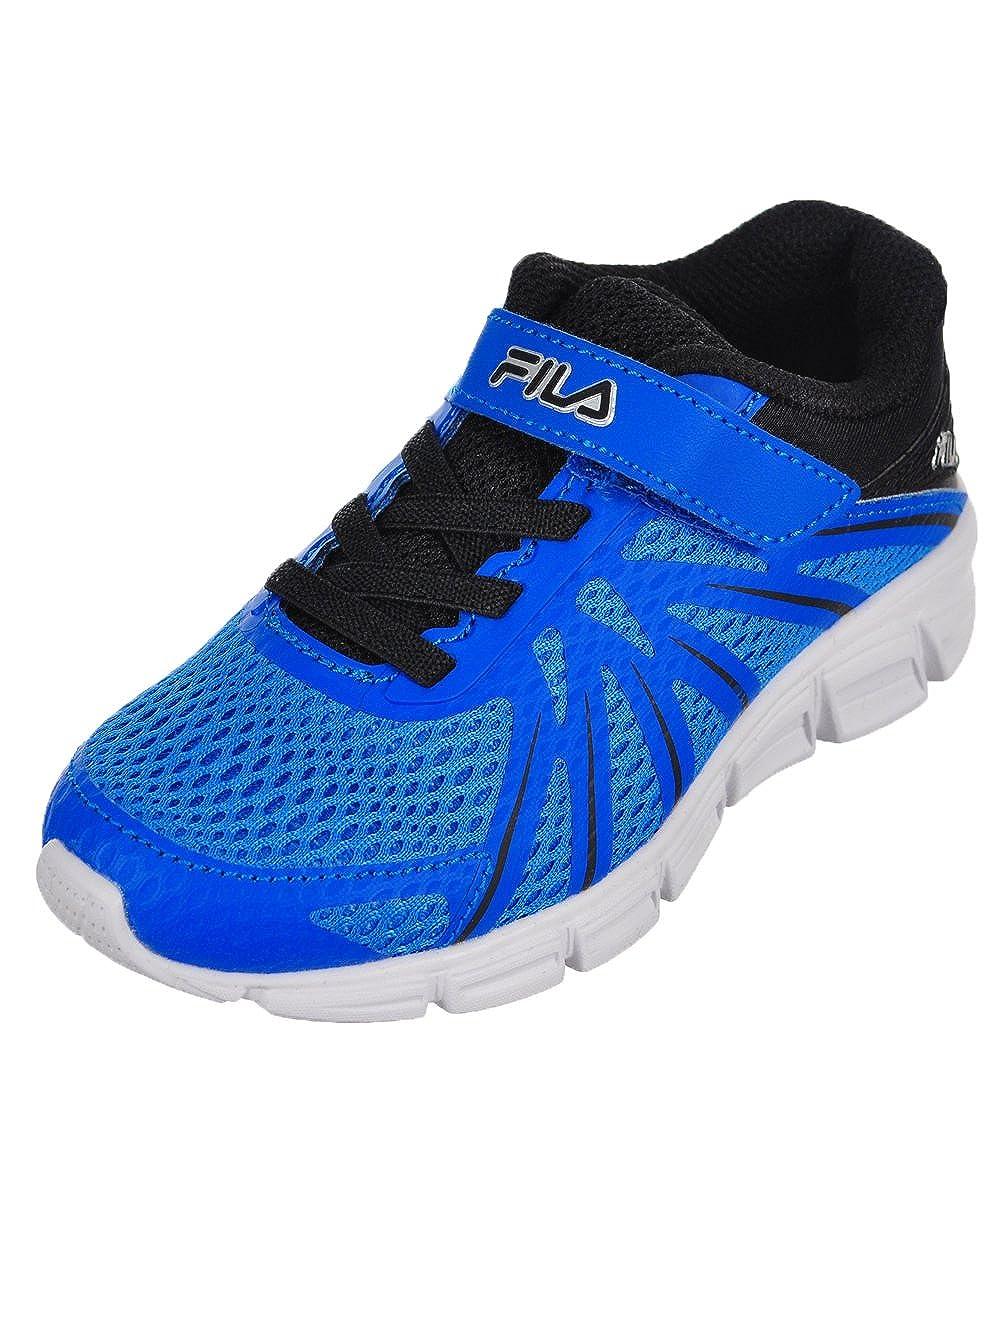 86d3acc7 Amazon.com | Fila Boys' Fraction Sneakers | Sneakers